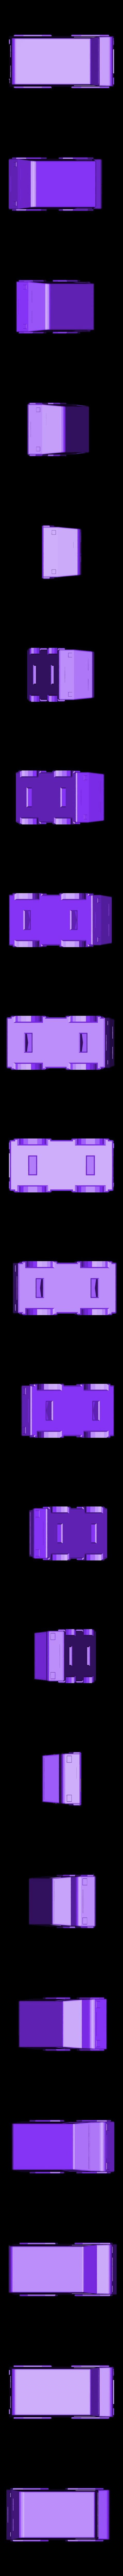 SmallToys-BodyVan01.stl Download STL file SmallToys - Cars pack • 3D print design, Wabby